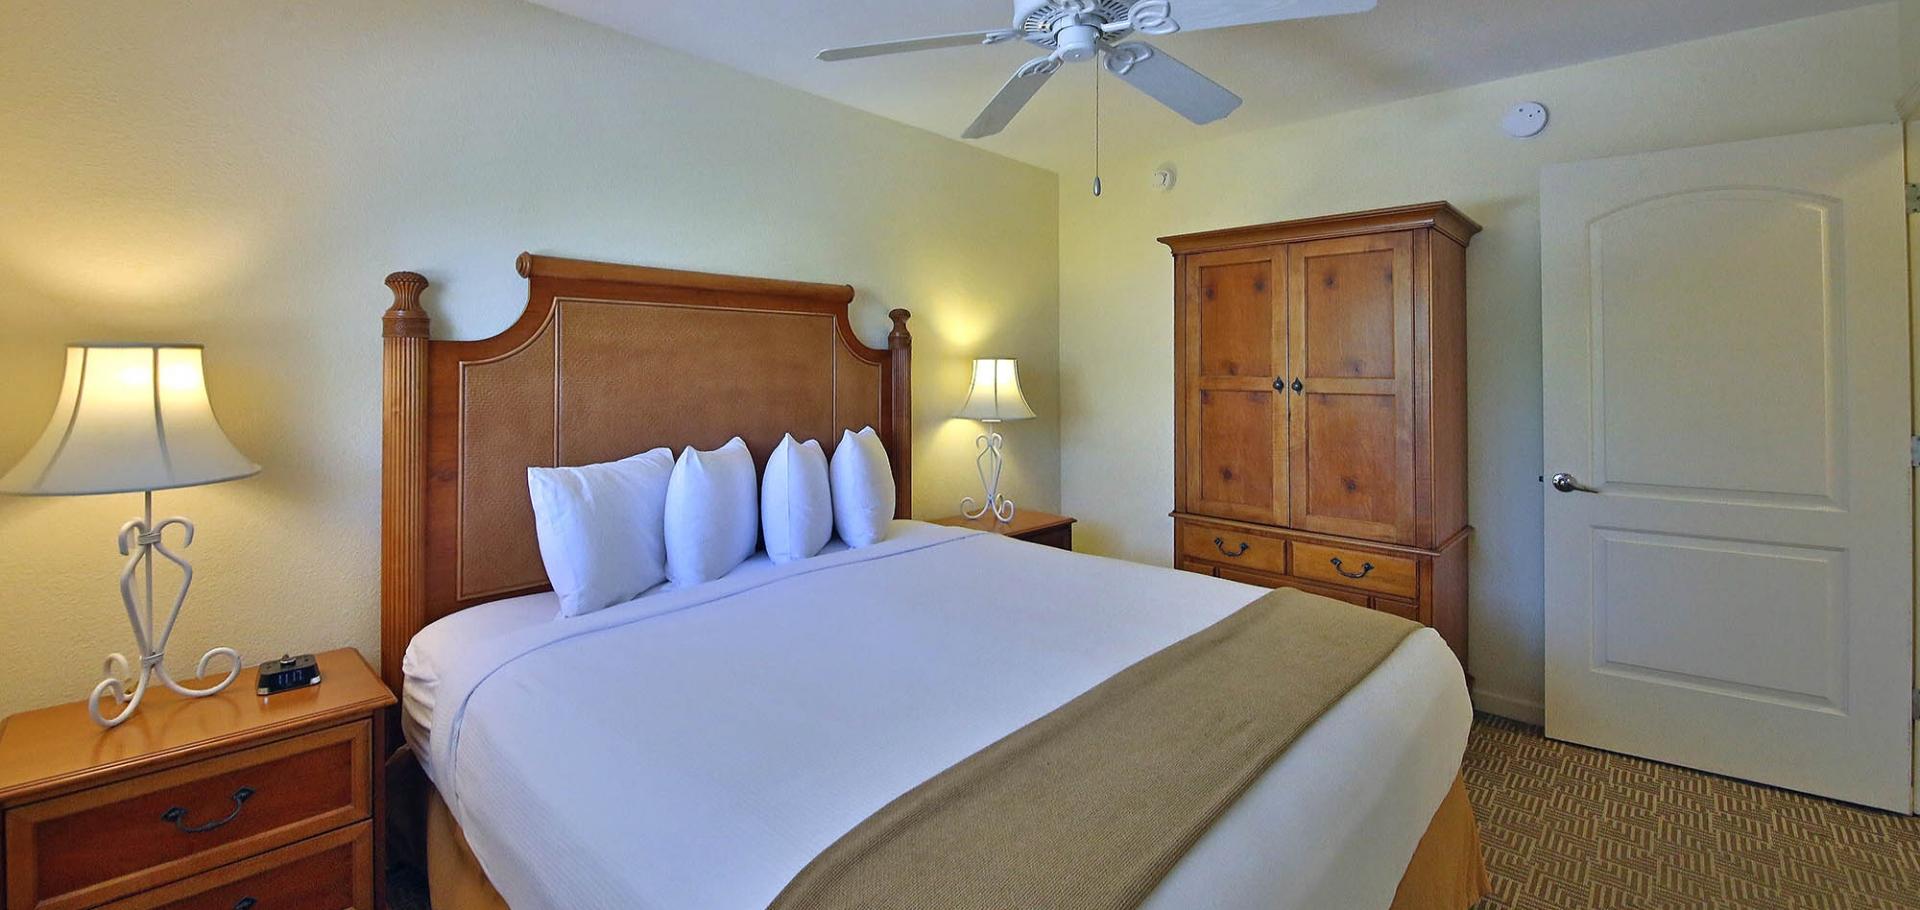 Sanibel Inn bed and bedroom